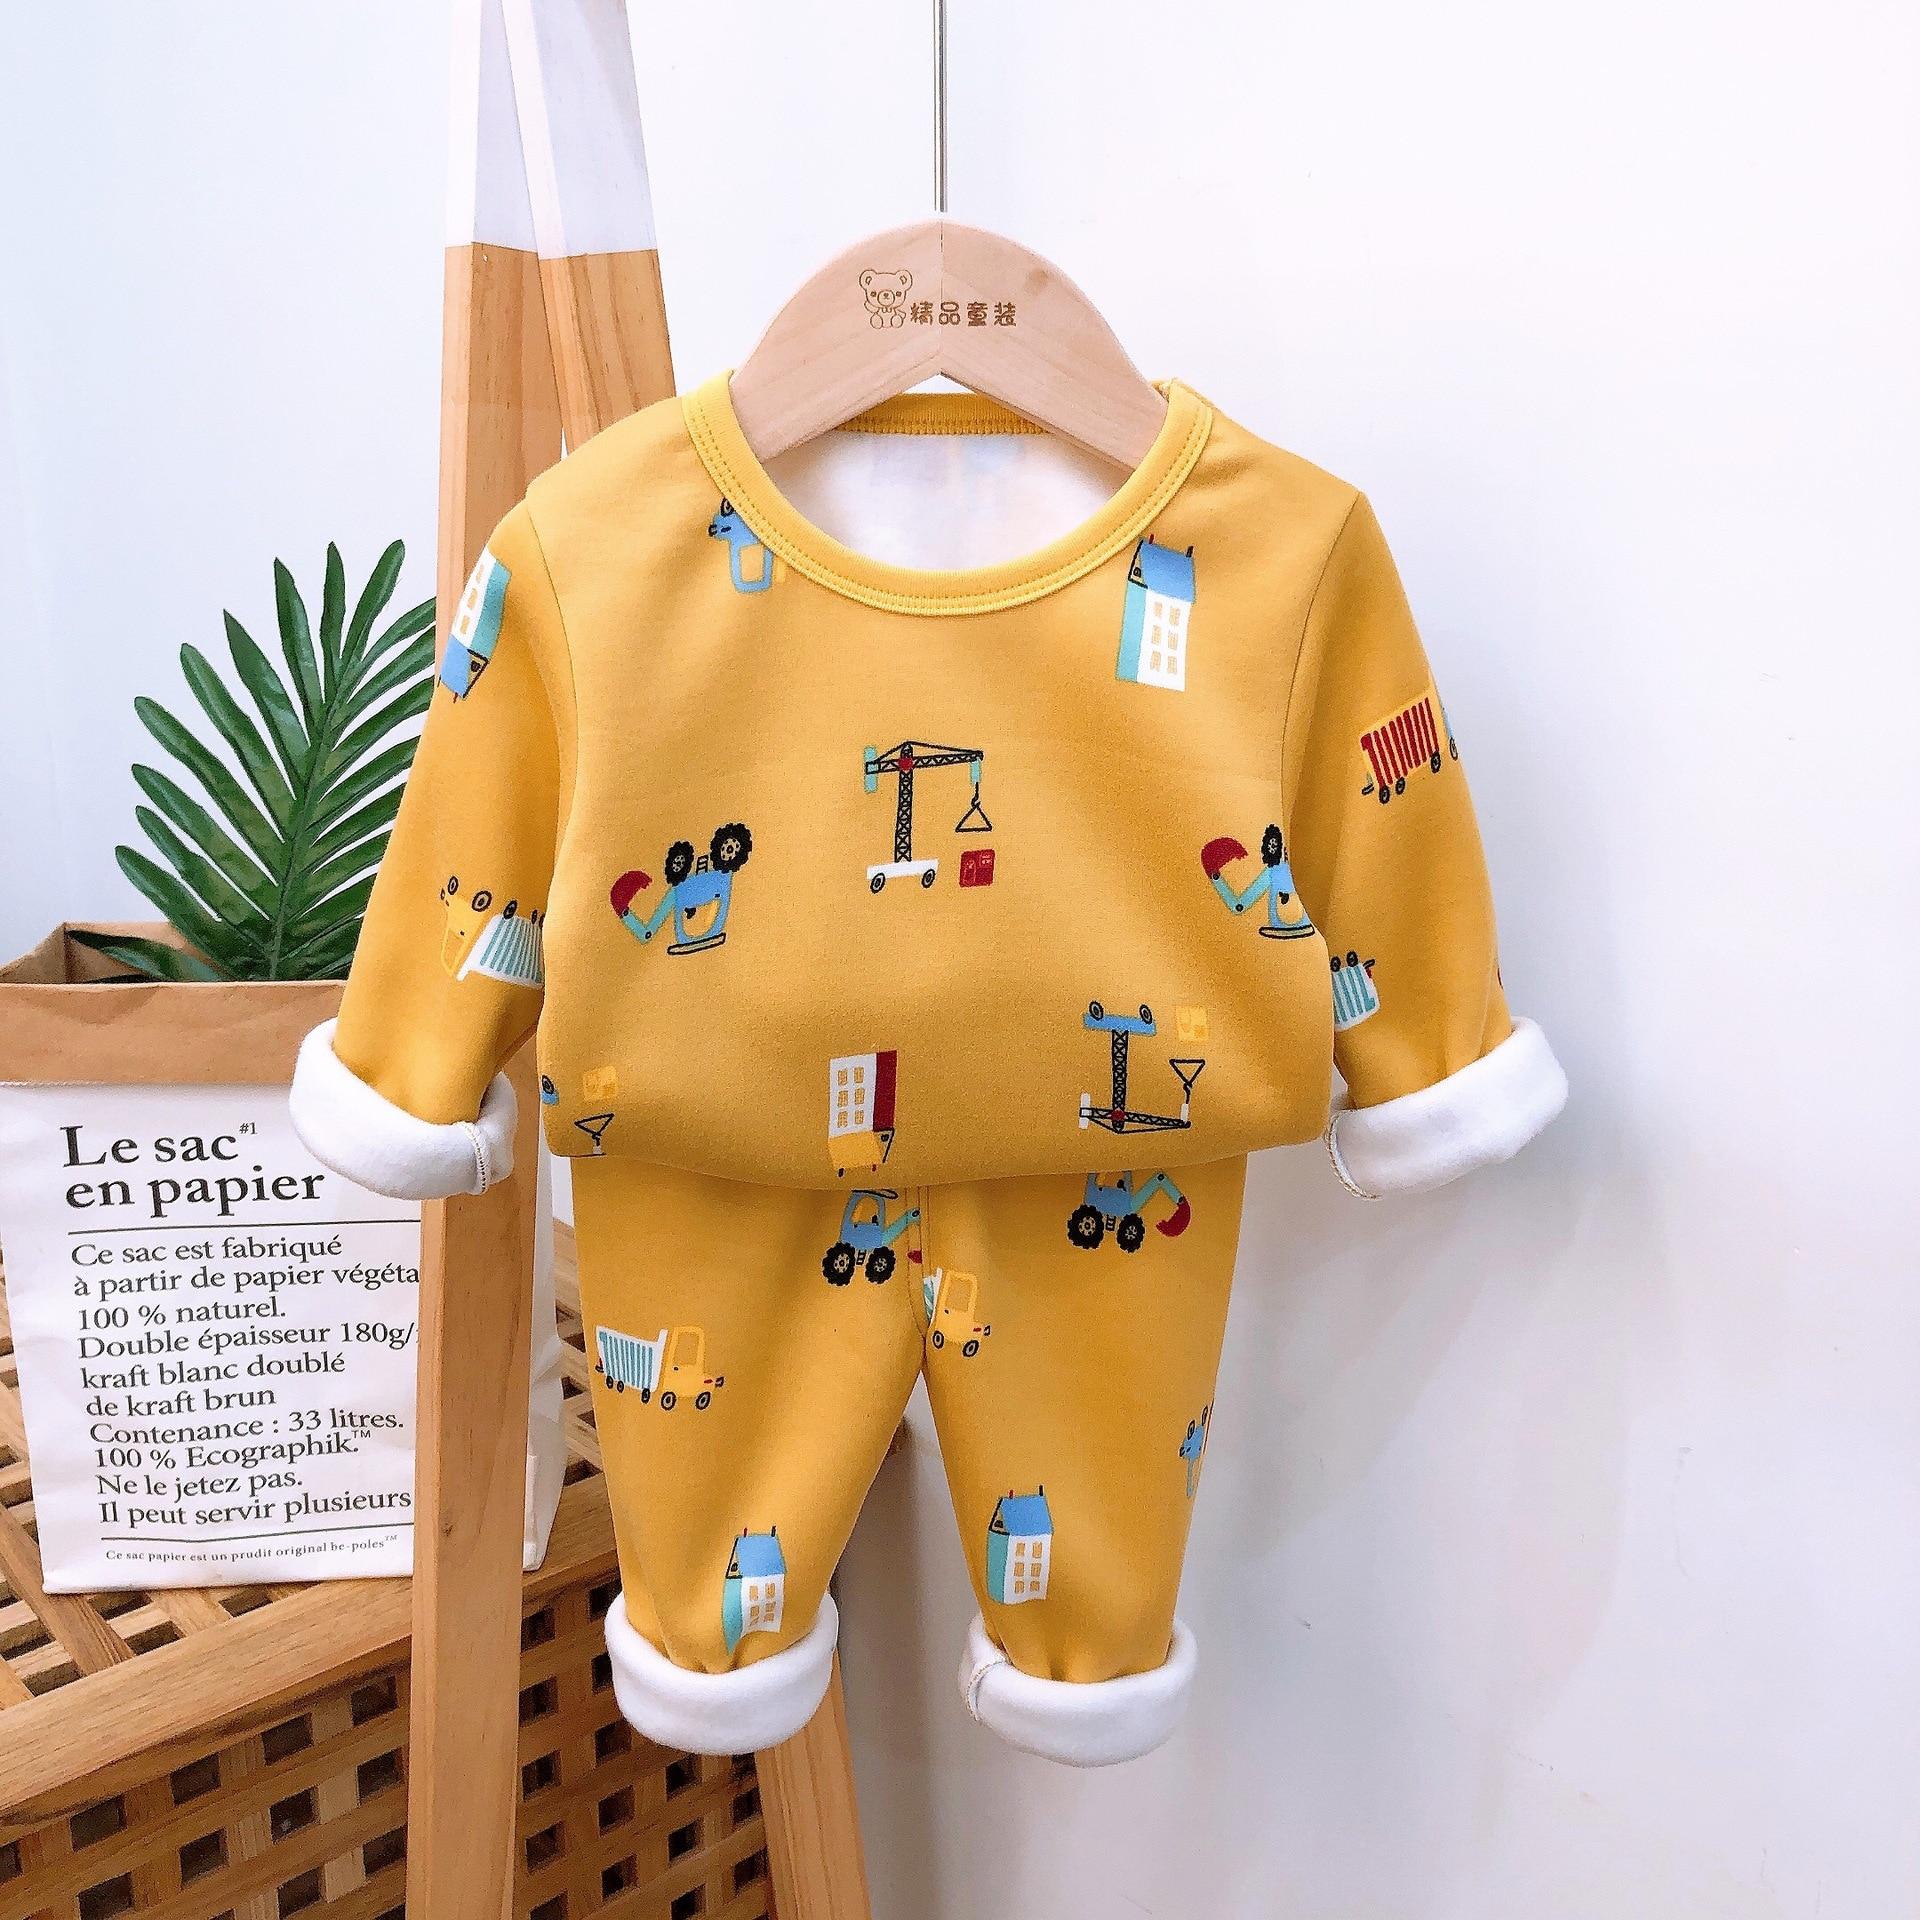 2020 Autumn Winter Thicken Velvet Children Pajamas Cartoon Family Boys Girls Clothing Set Kids Casual Sleepwear Suits Clothes 4